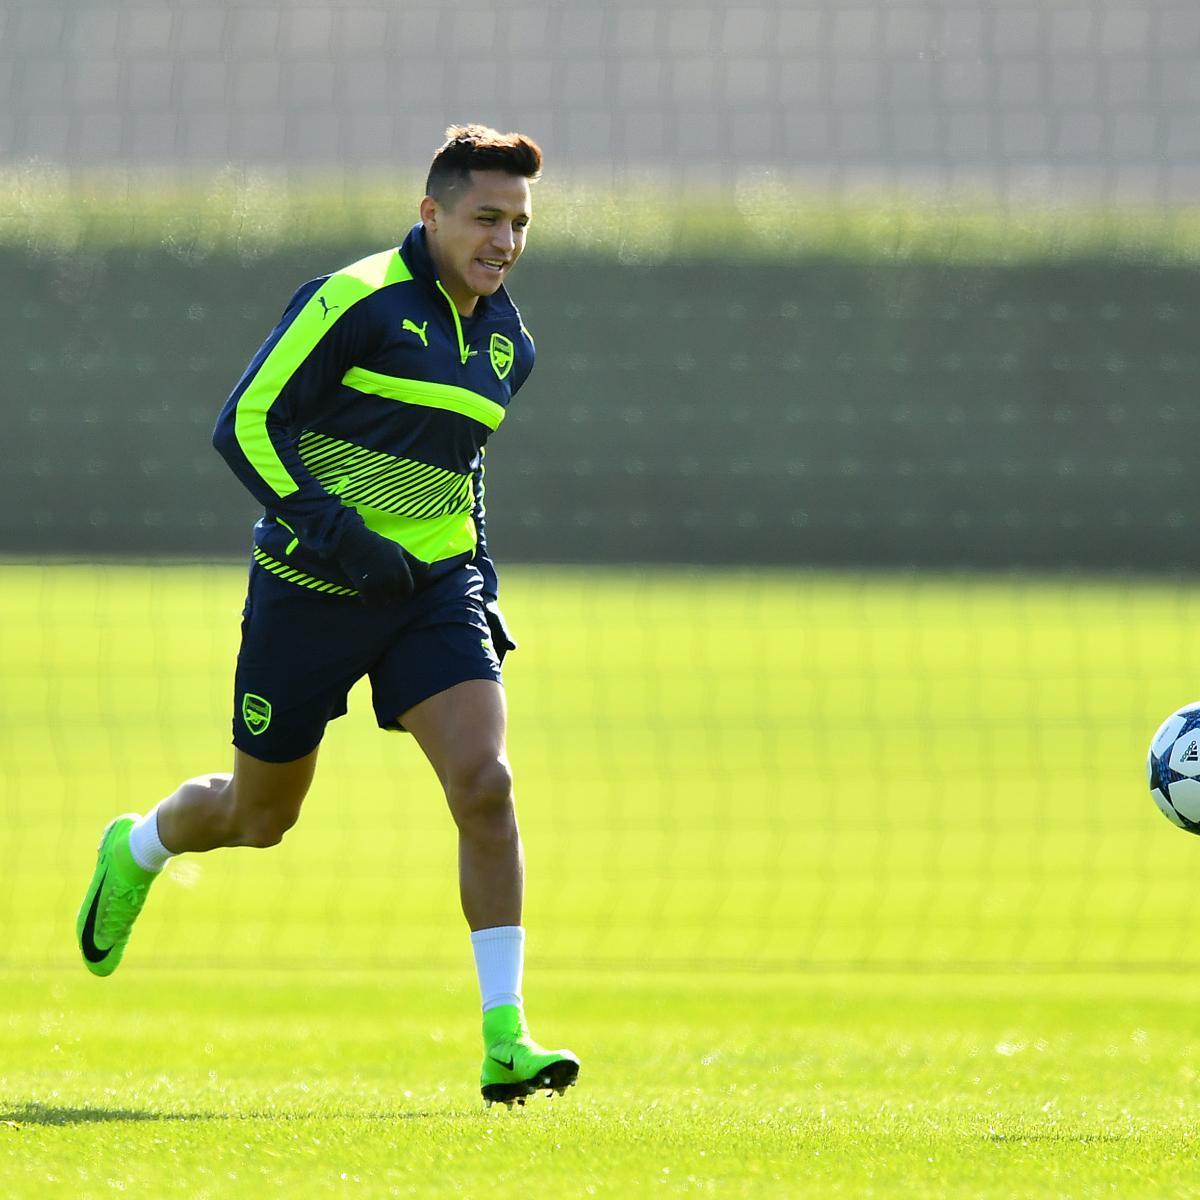 Psg Transfer News Latest On Lucas Moura Top Rumours: Arsenal Transfer News: Latest Rumours On Alexis Sanchez